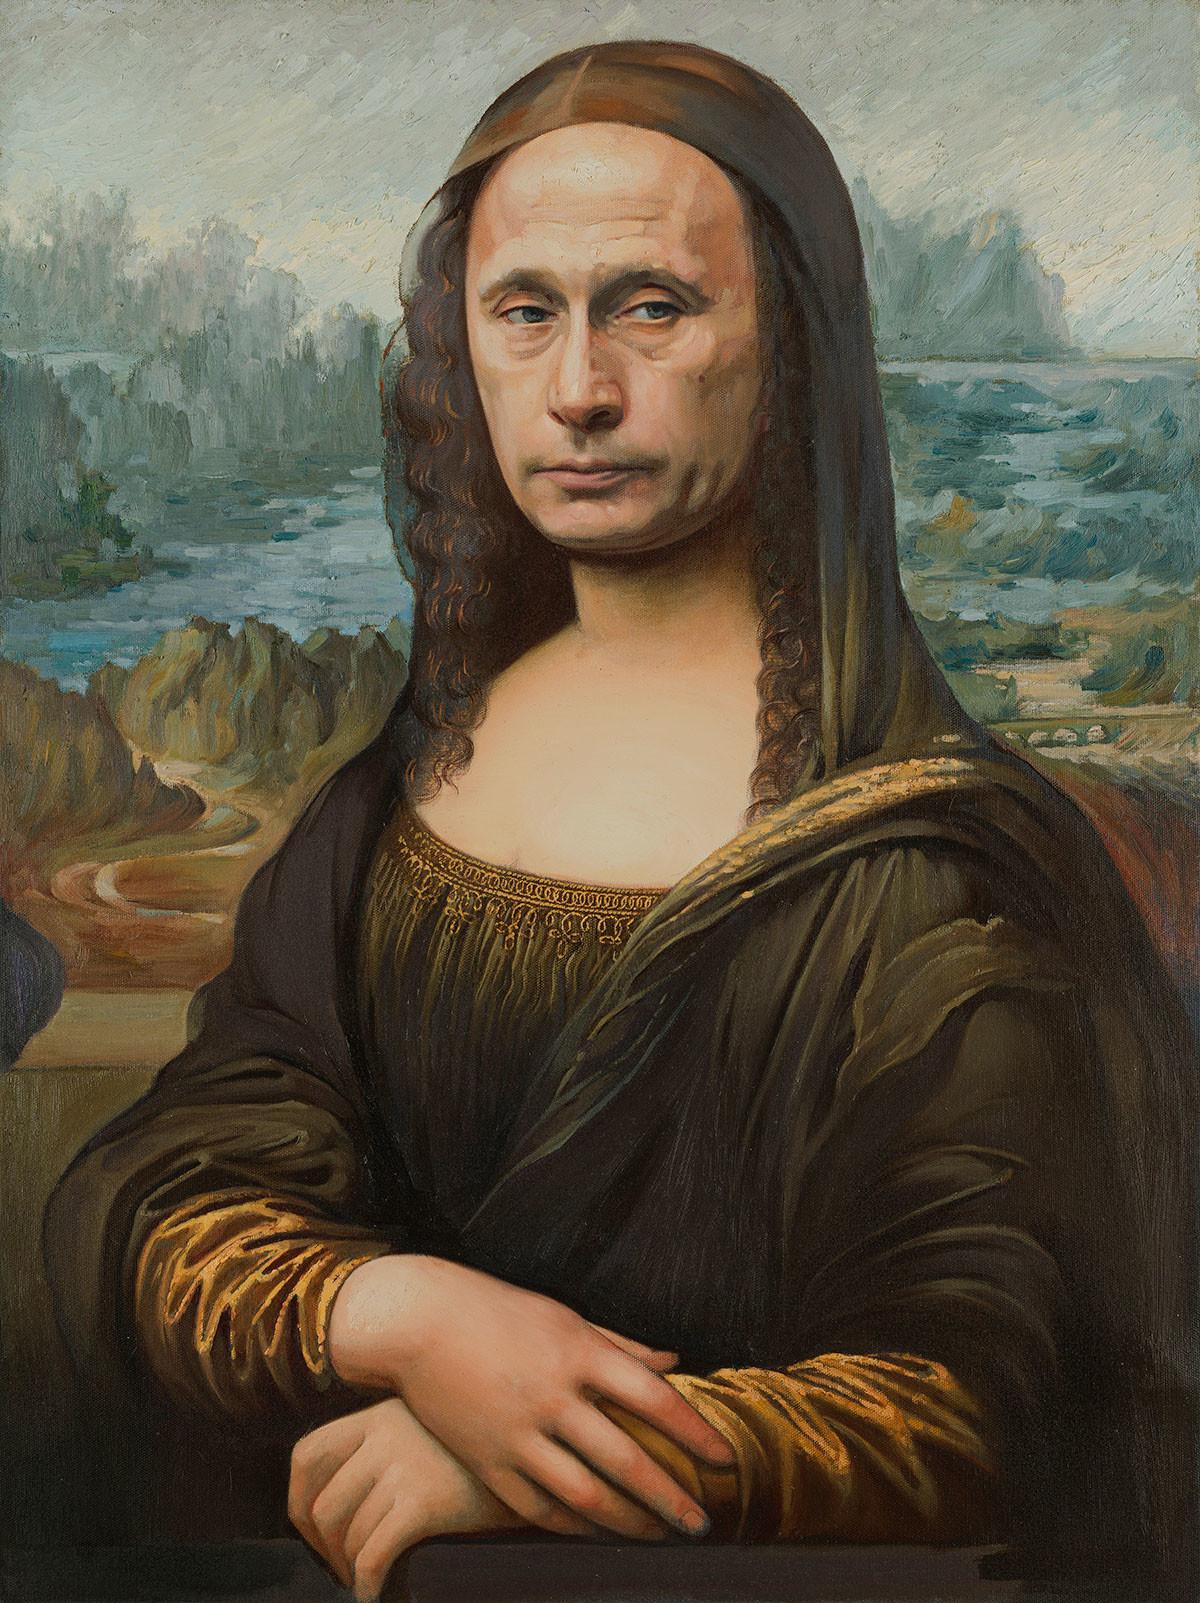 Aleksander Kosolapov. Mona Lisa, 2020